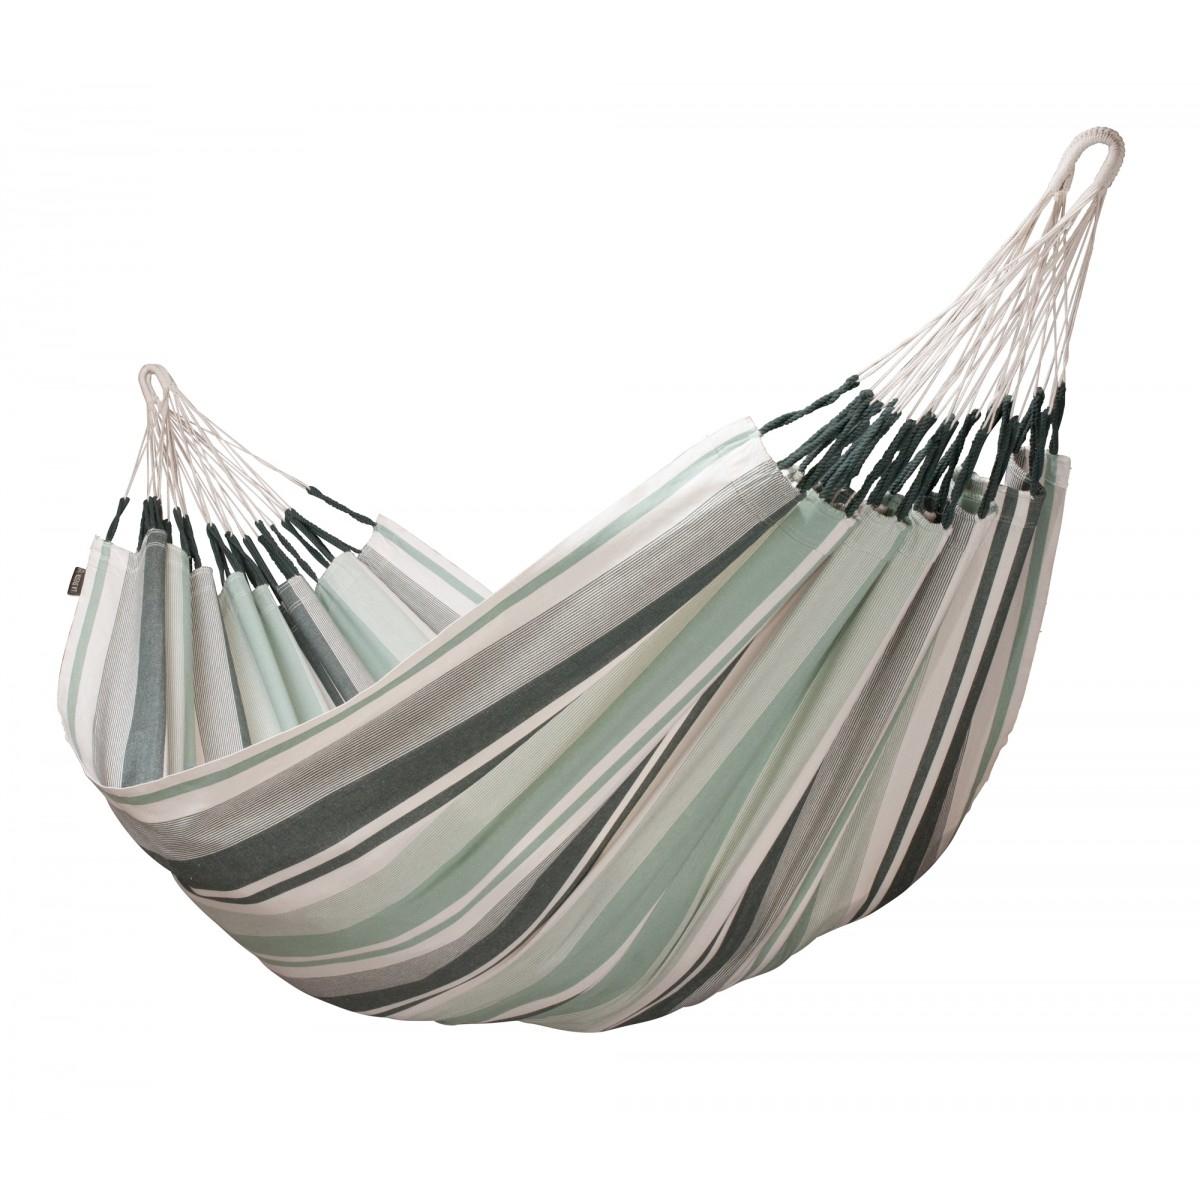 la siesta doppel h ngematte paloma olive bei lasiesta shop ch kaufen. Black Bedroom Furniture Sets. Home Design Ideas